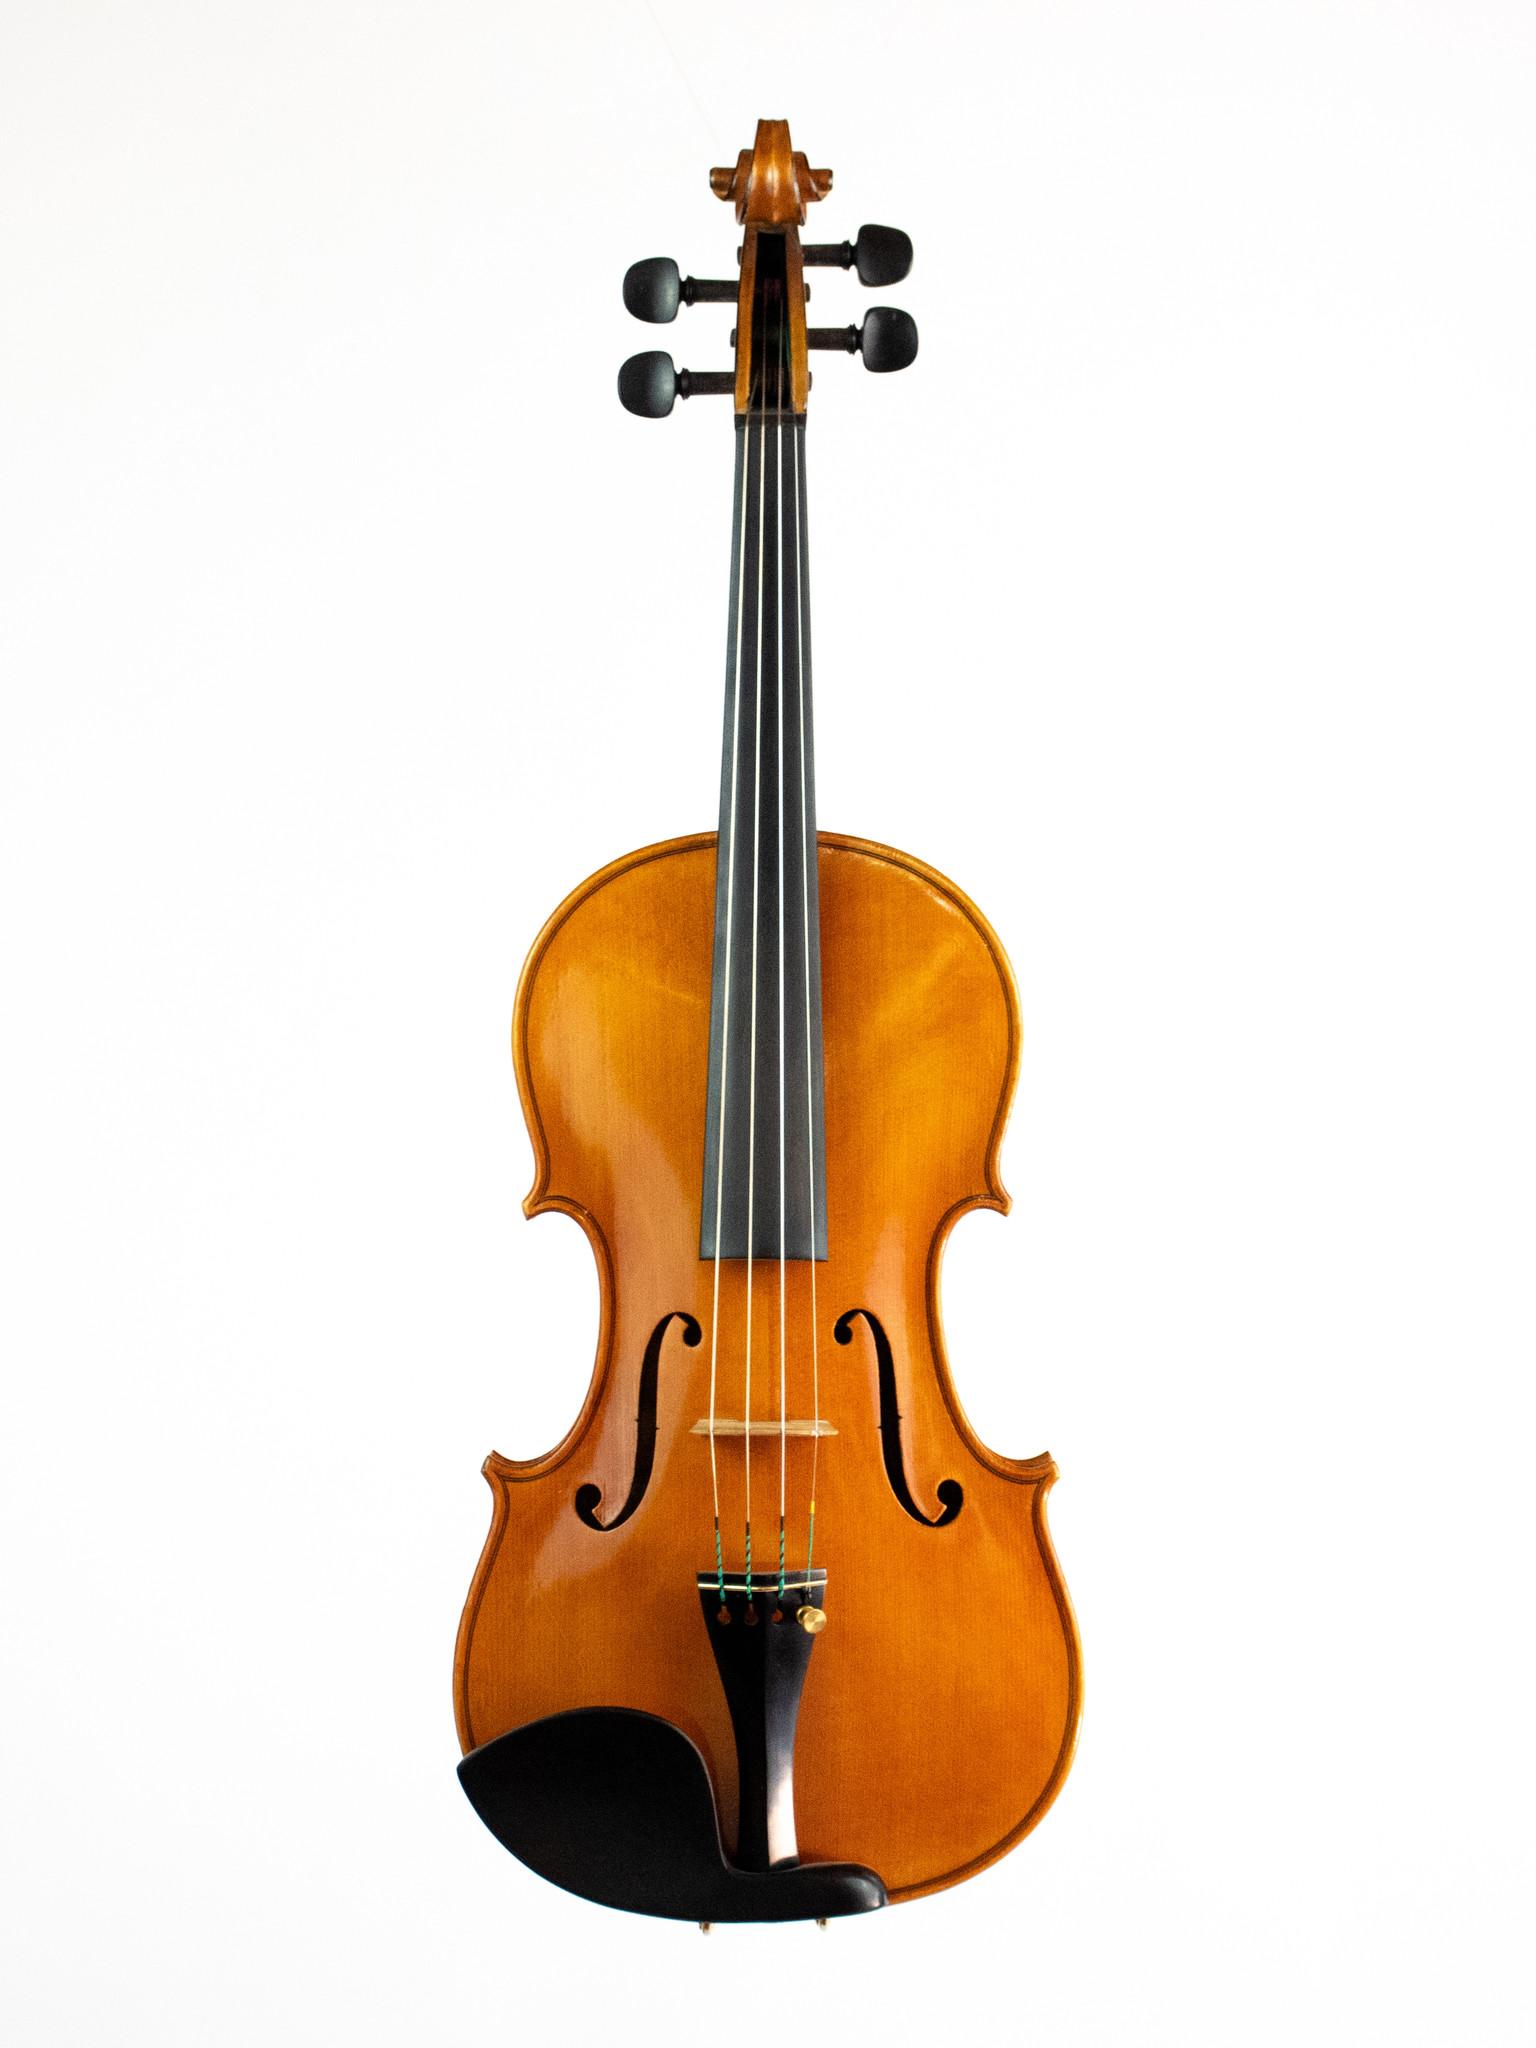 Dulcis et Fortis French 4/4 violin, JTL, ca. 1920